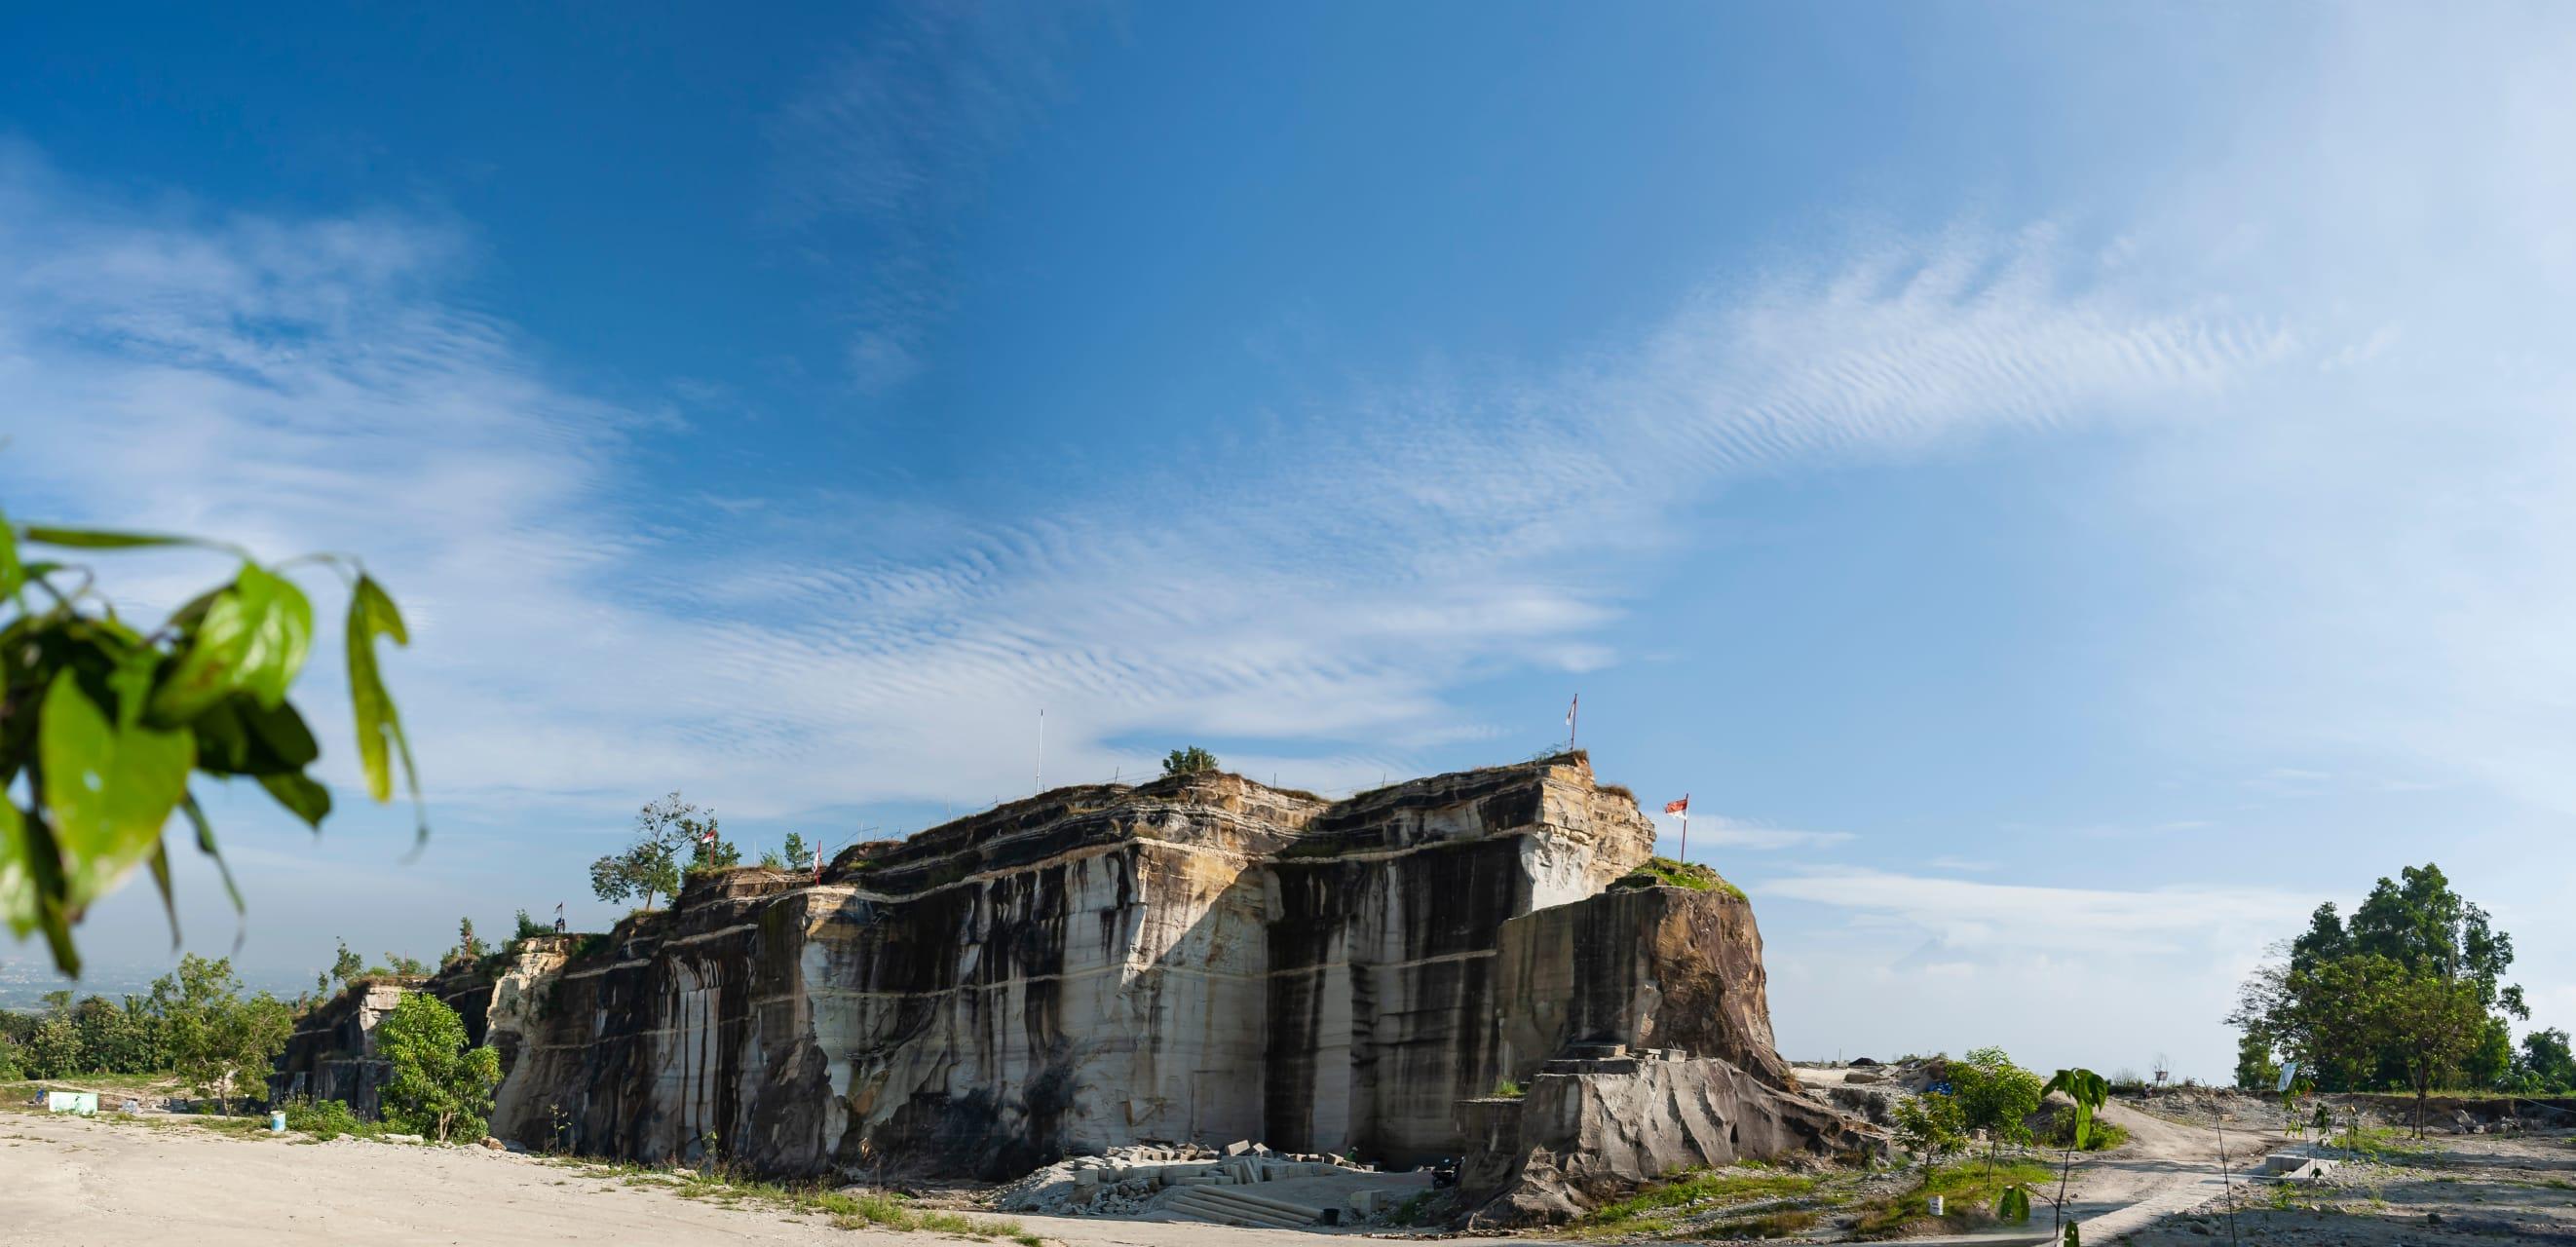 Yogyakarta - Breksi Cliff: Former Breccia Quarry That Became Tourist Attraction